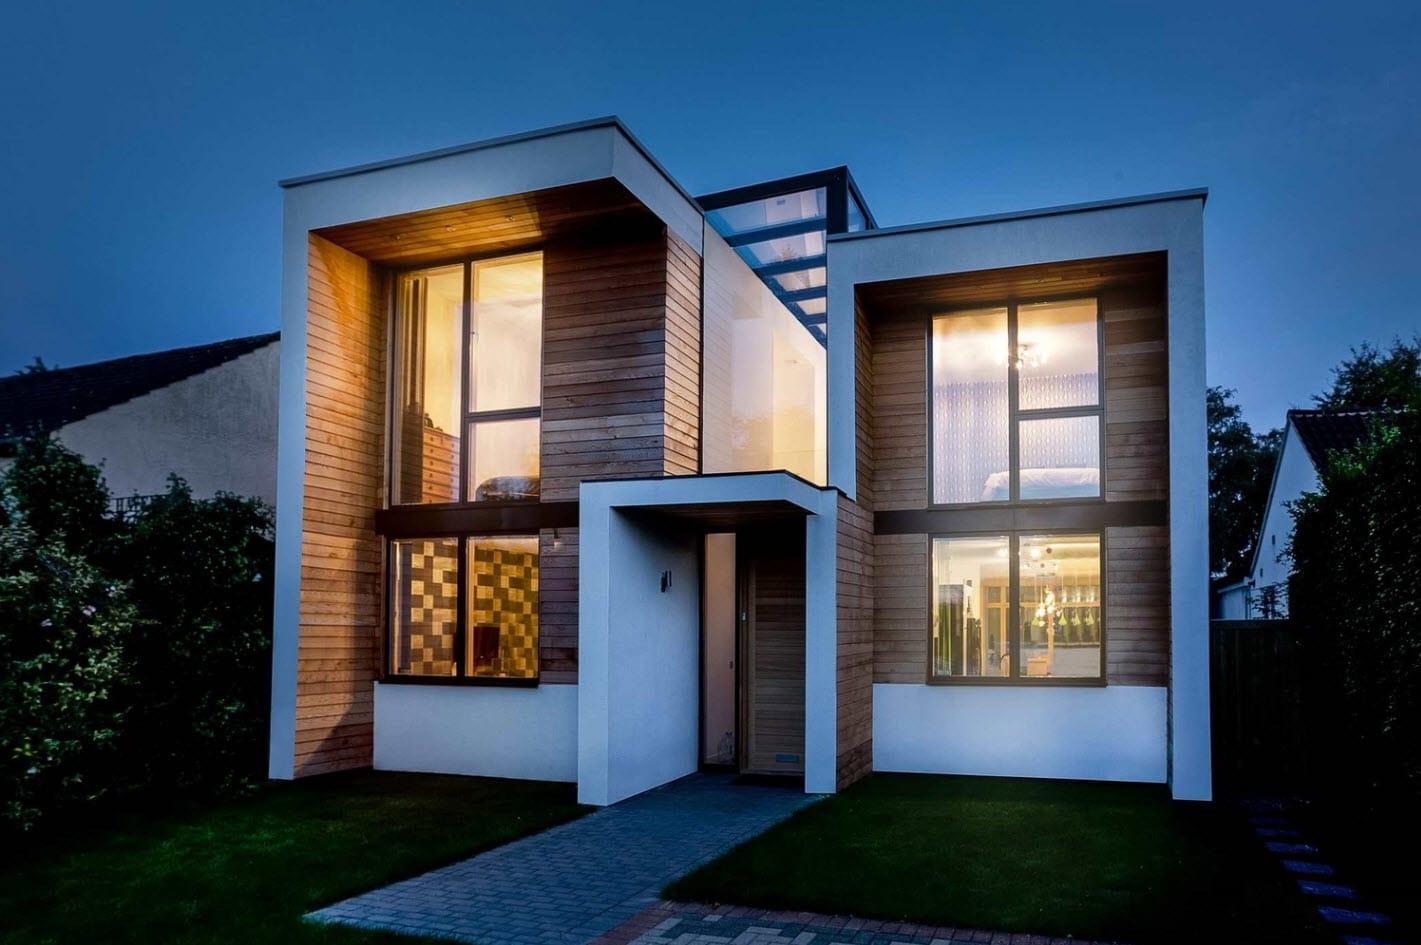 Disenos para casas modernas dise os arquitect nicos for Casa moderna gardone